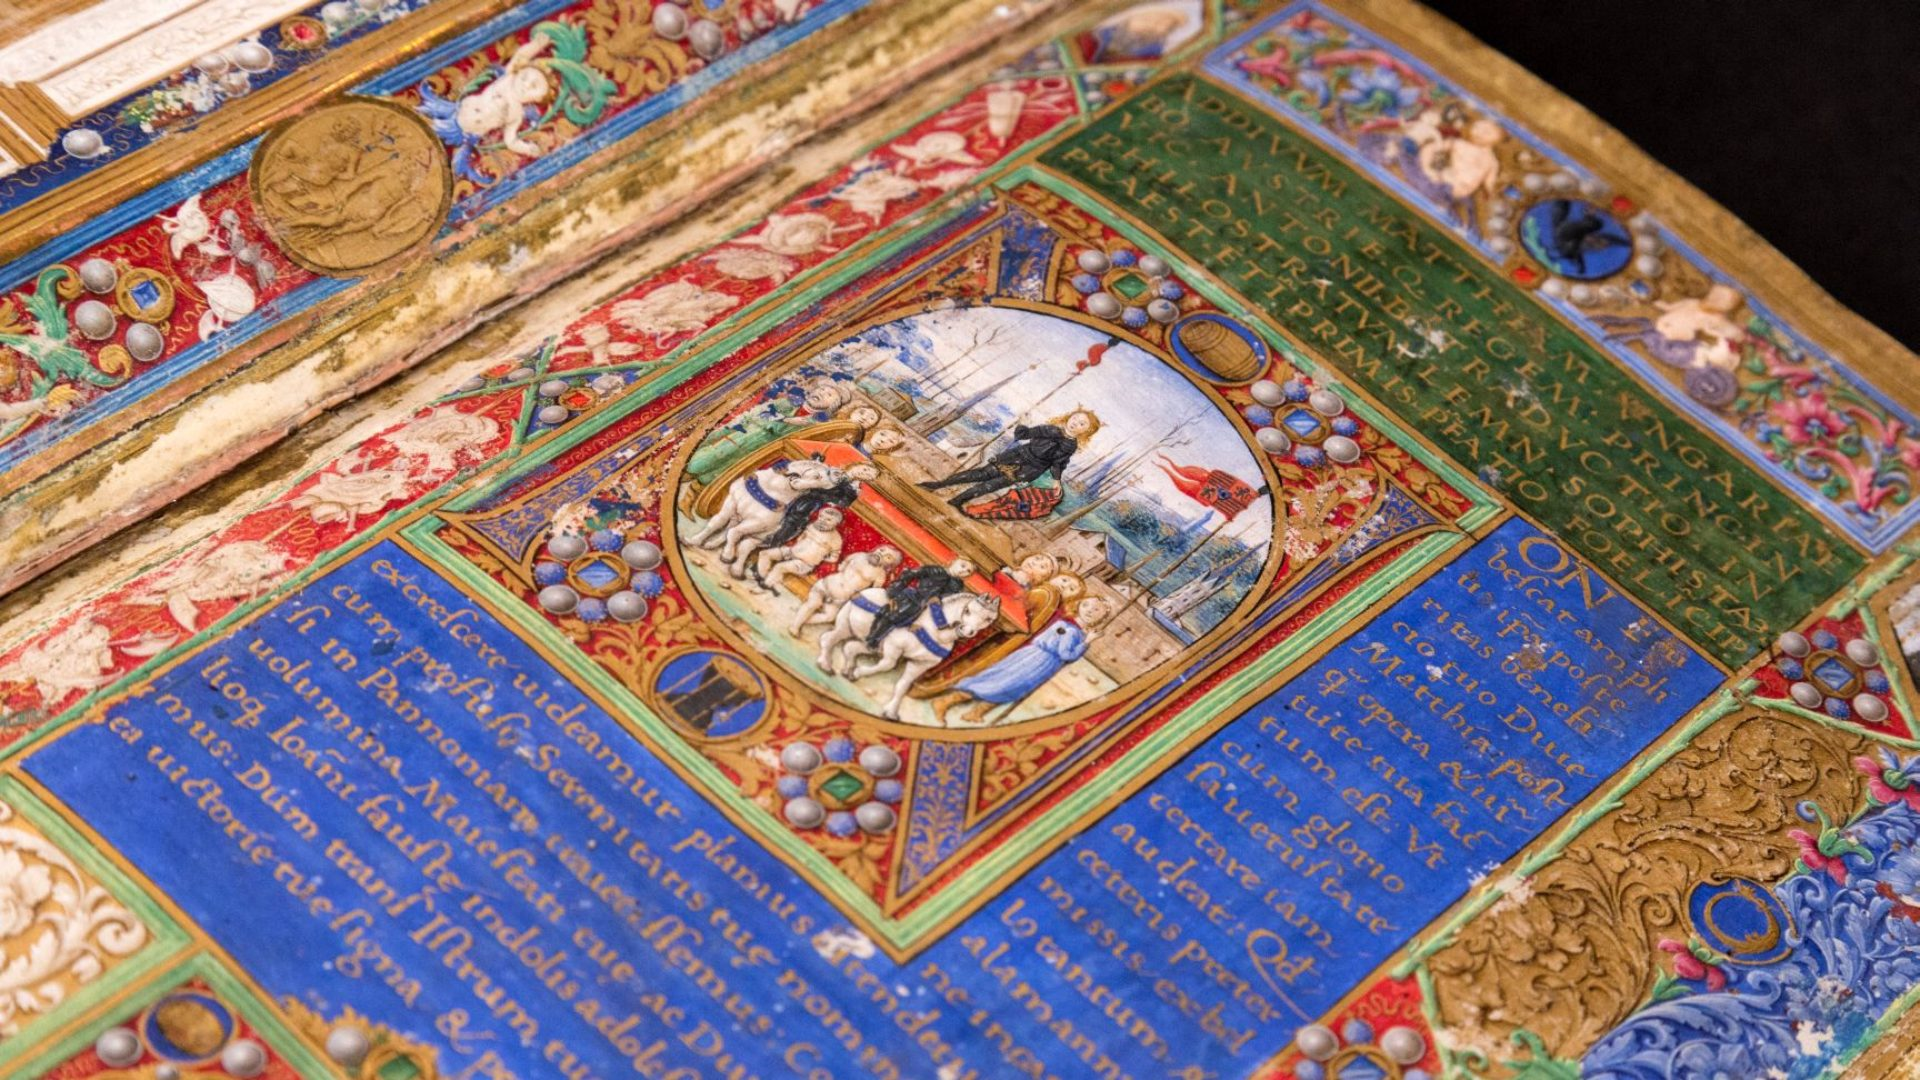 Bibliotheca Corvina Virtualis